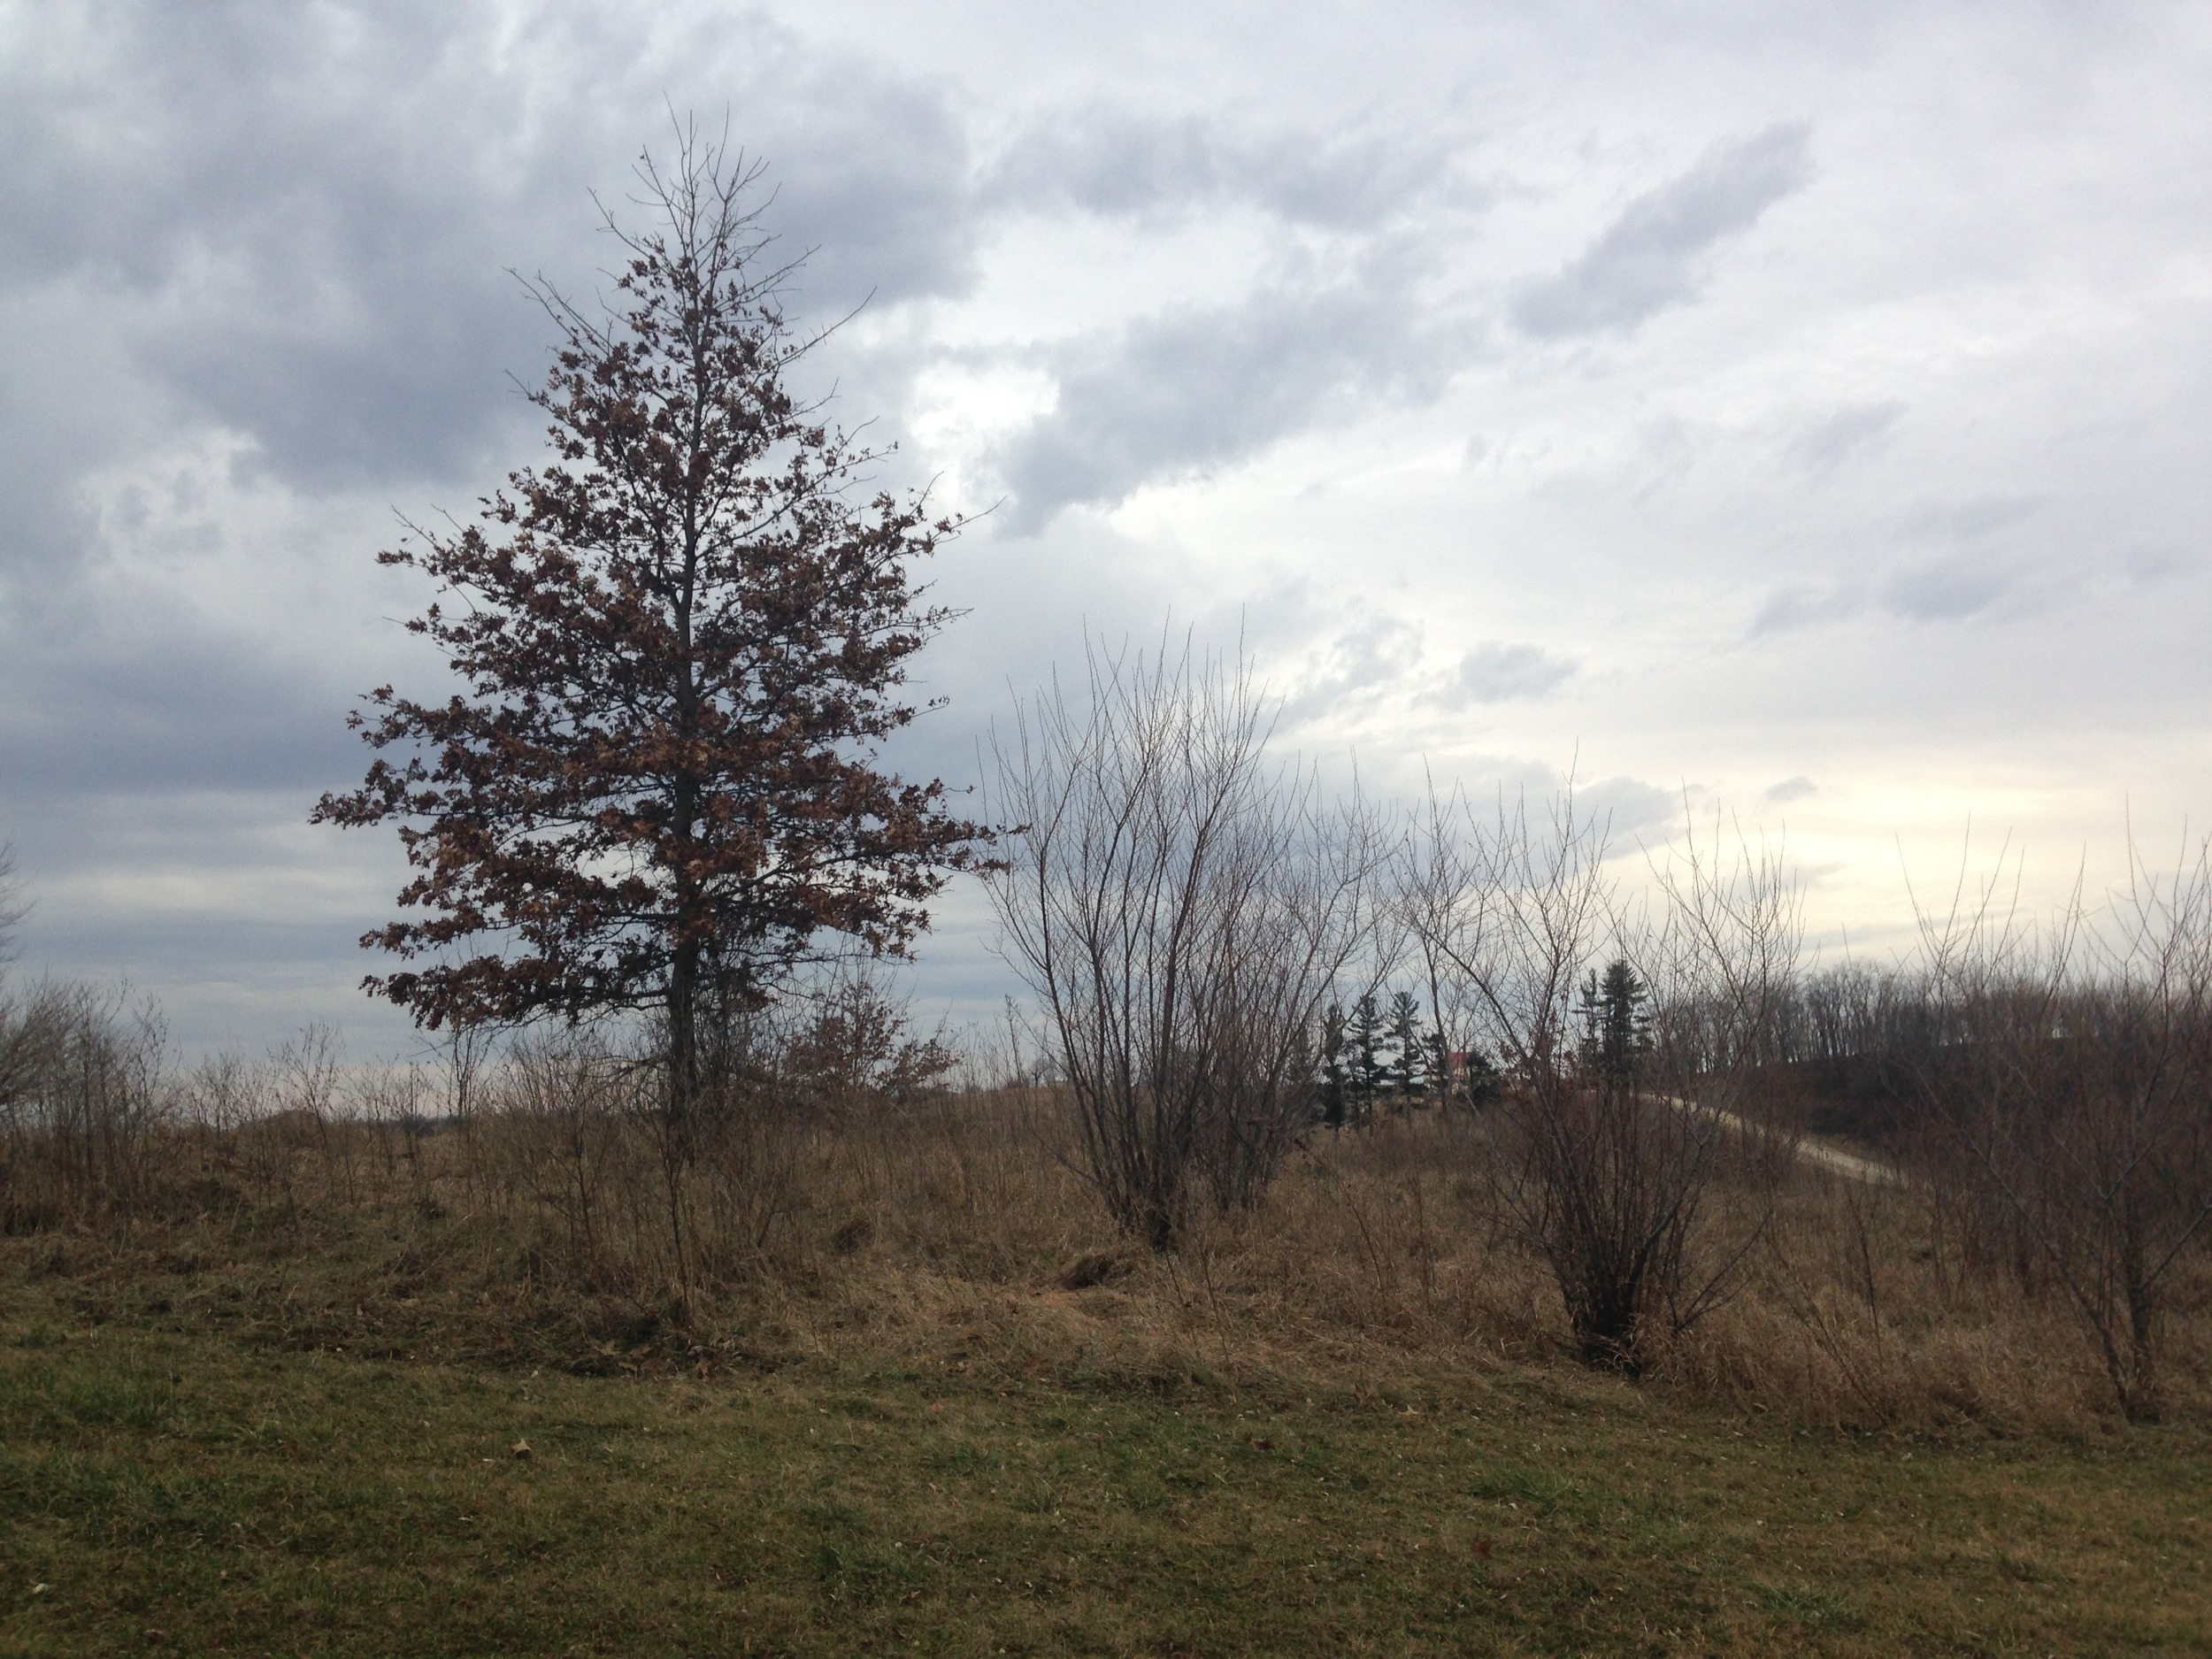 Ashlee-Property-Cloudy.jpg